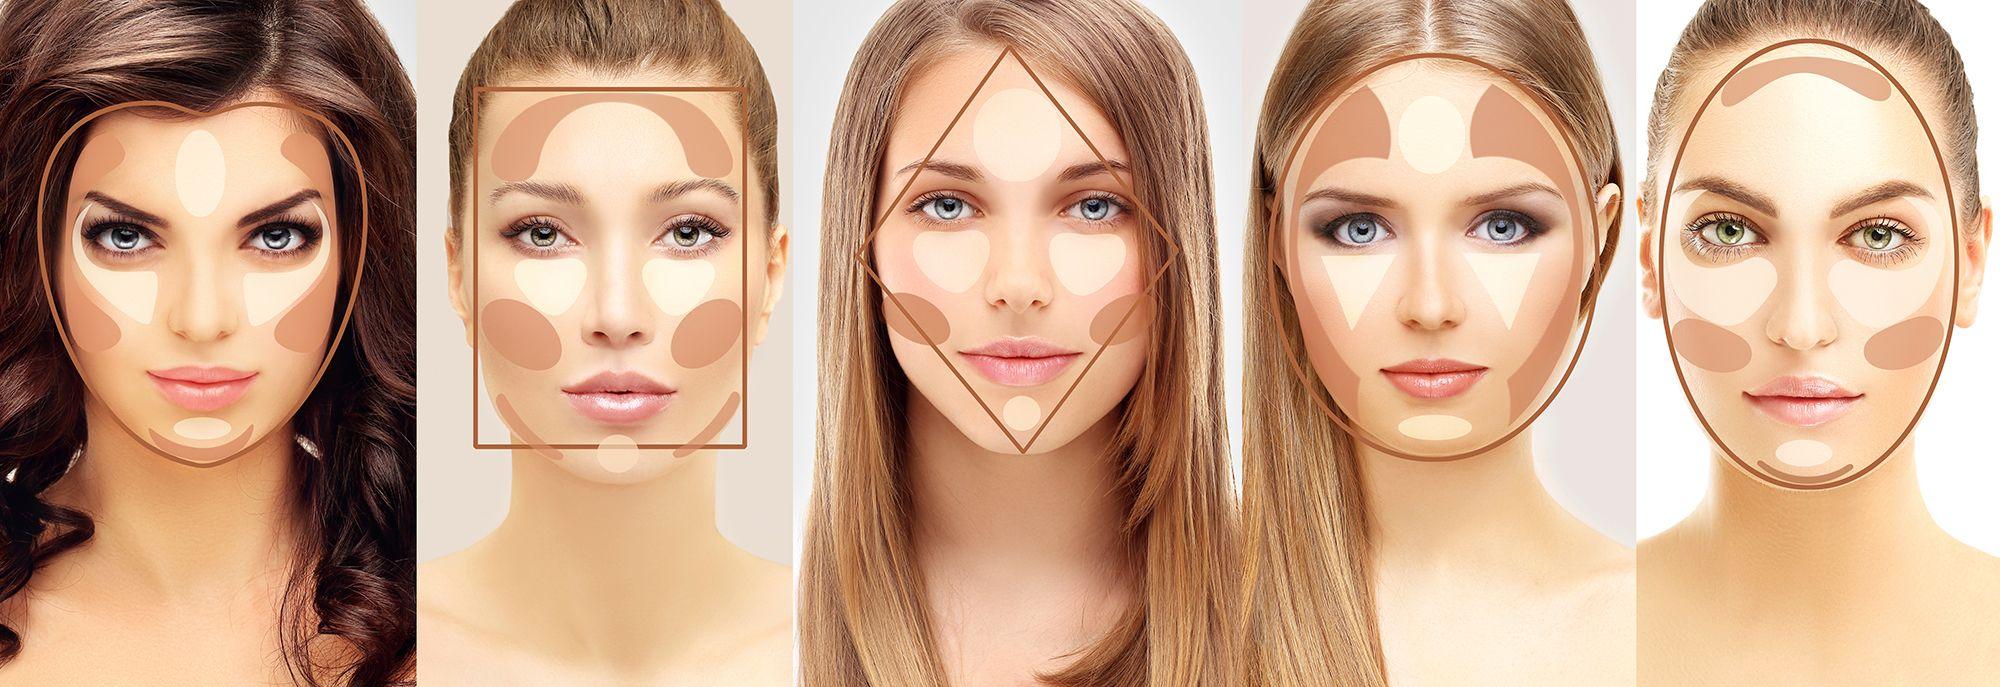 maquillaje contorno según forma rostro